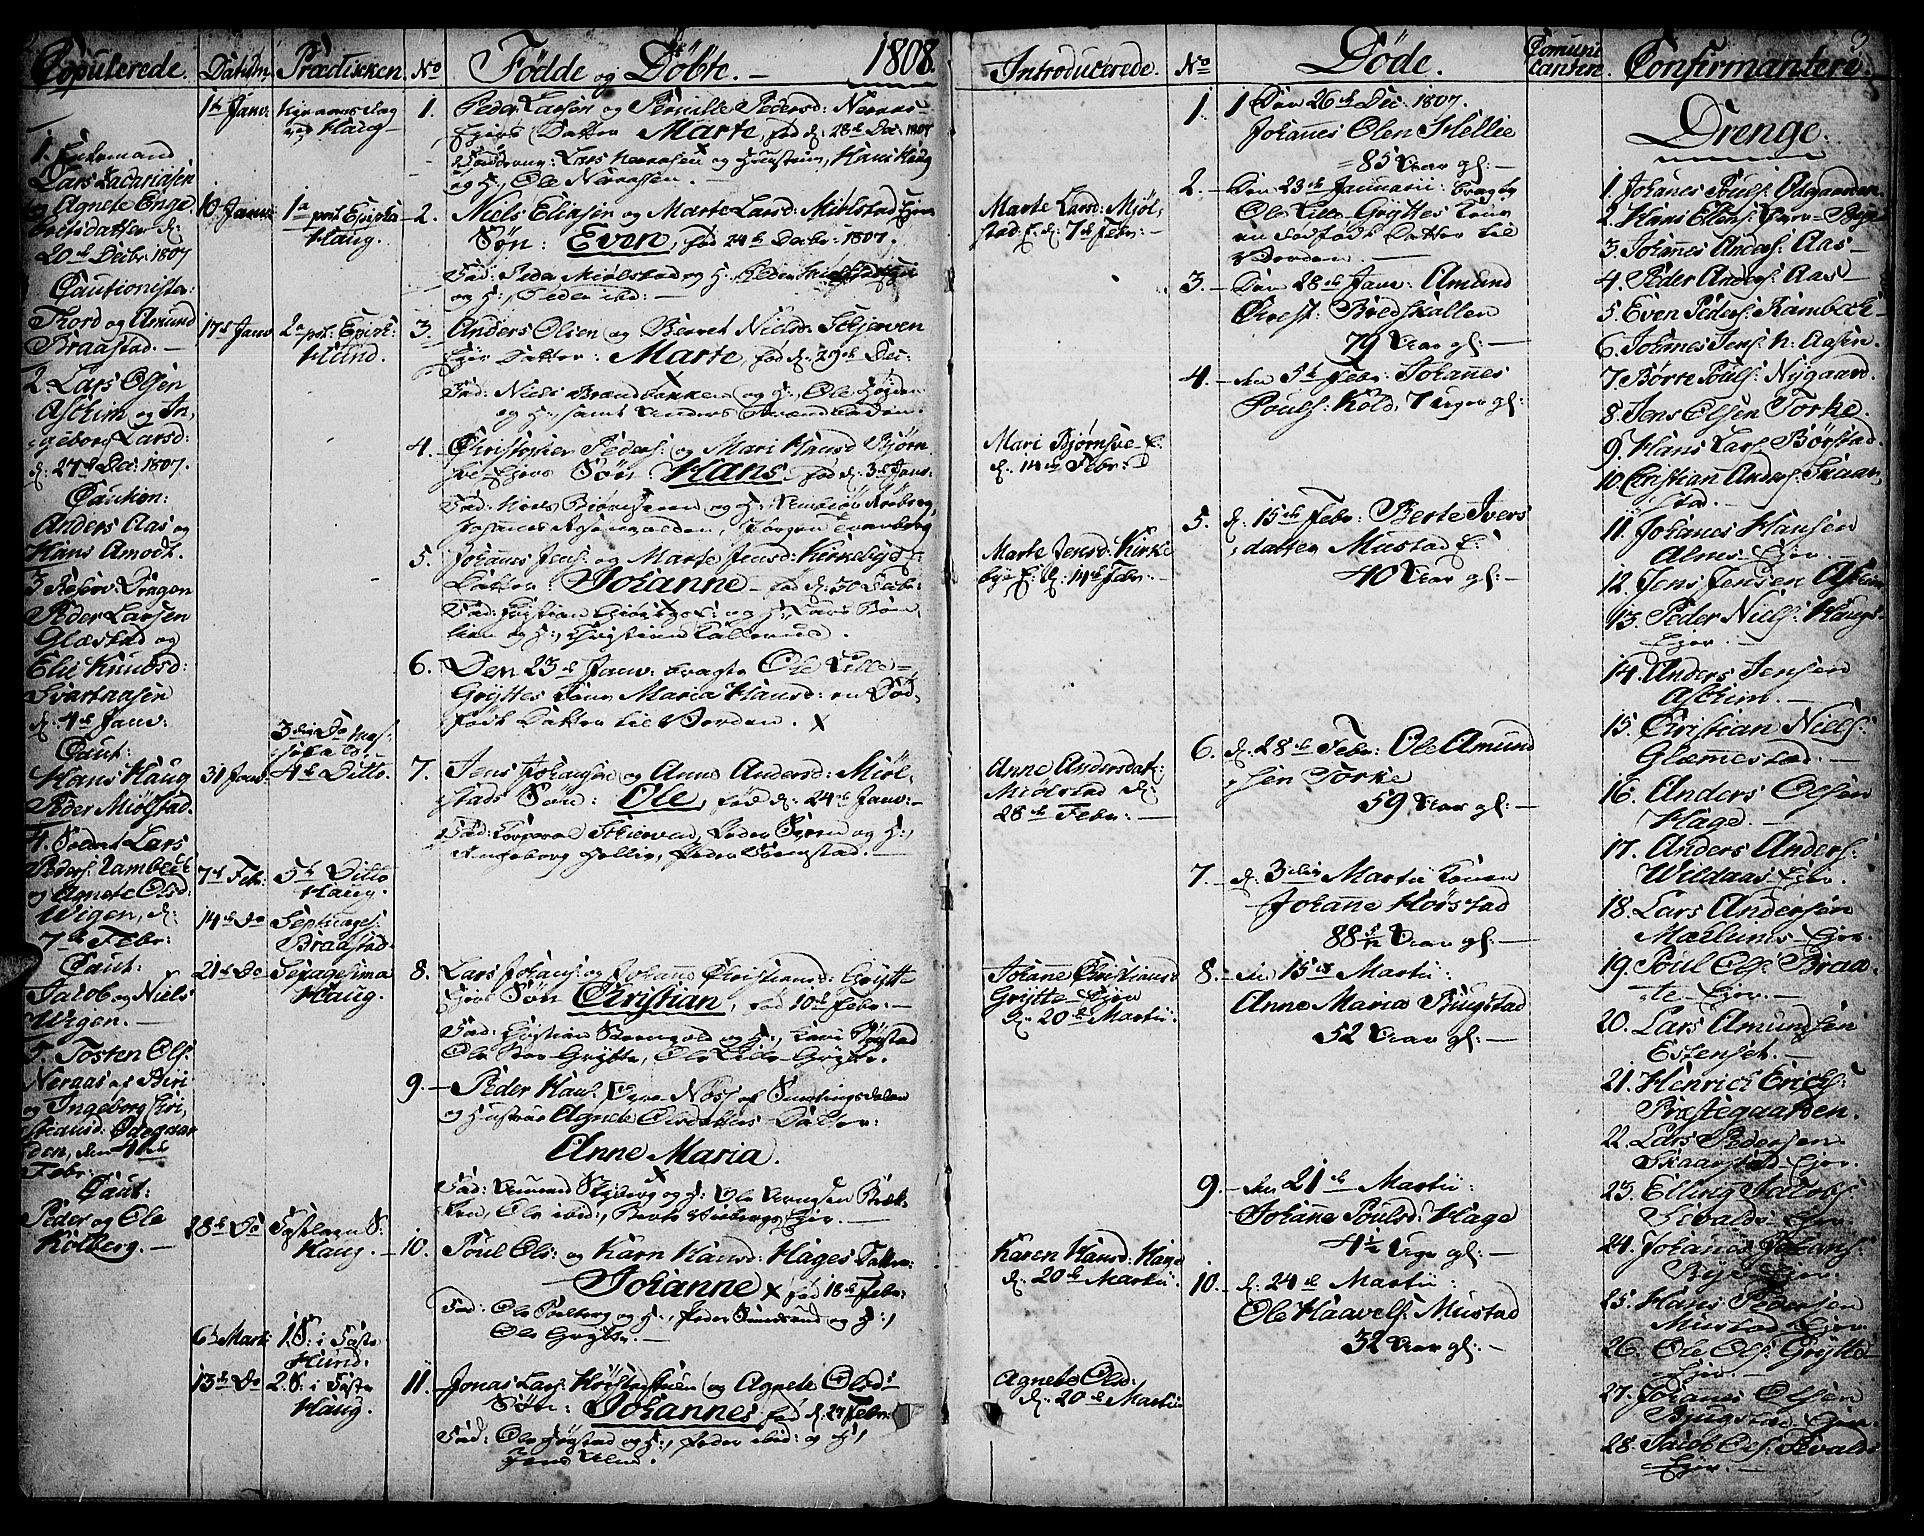 SAH, Vardal prestekontor, H/Ha/Haa/L0003: Ministerialbok nr. 3, 1808-1814, s. 2-3